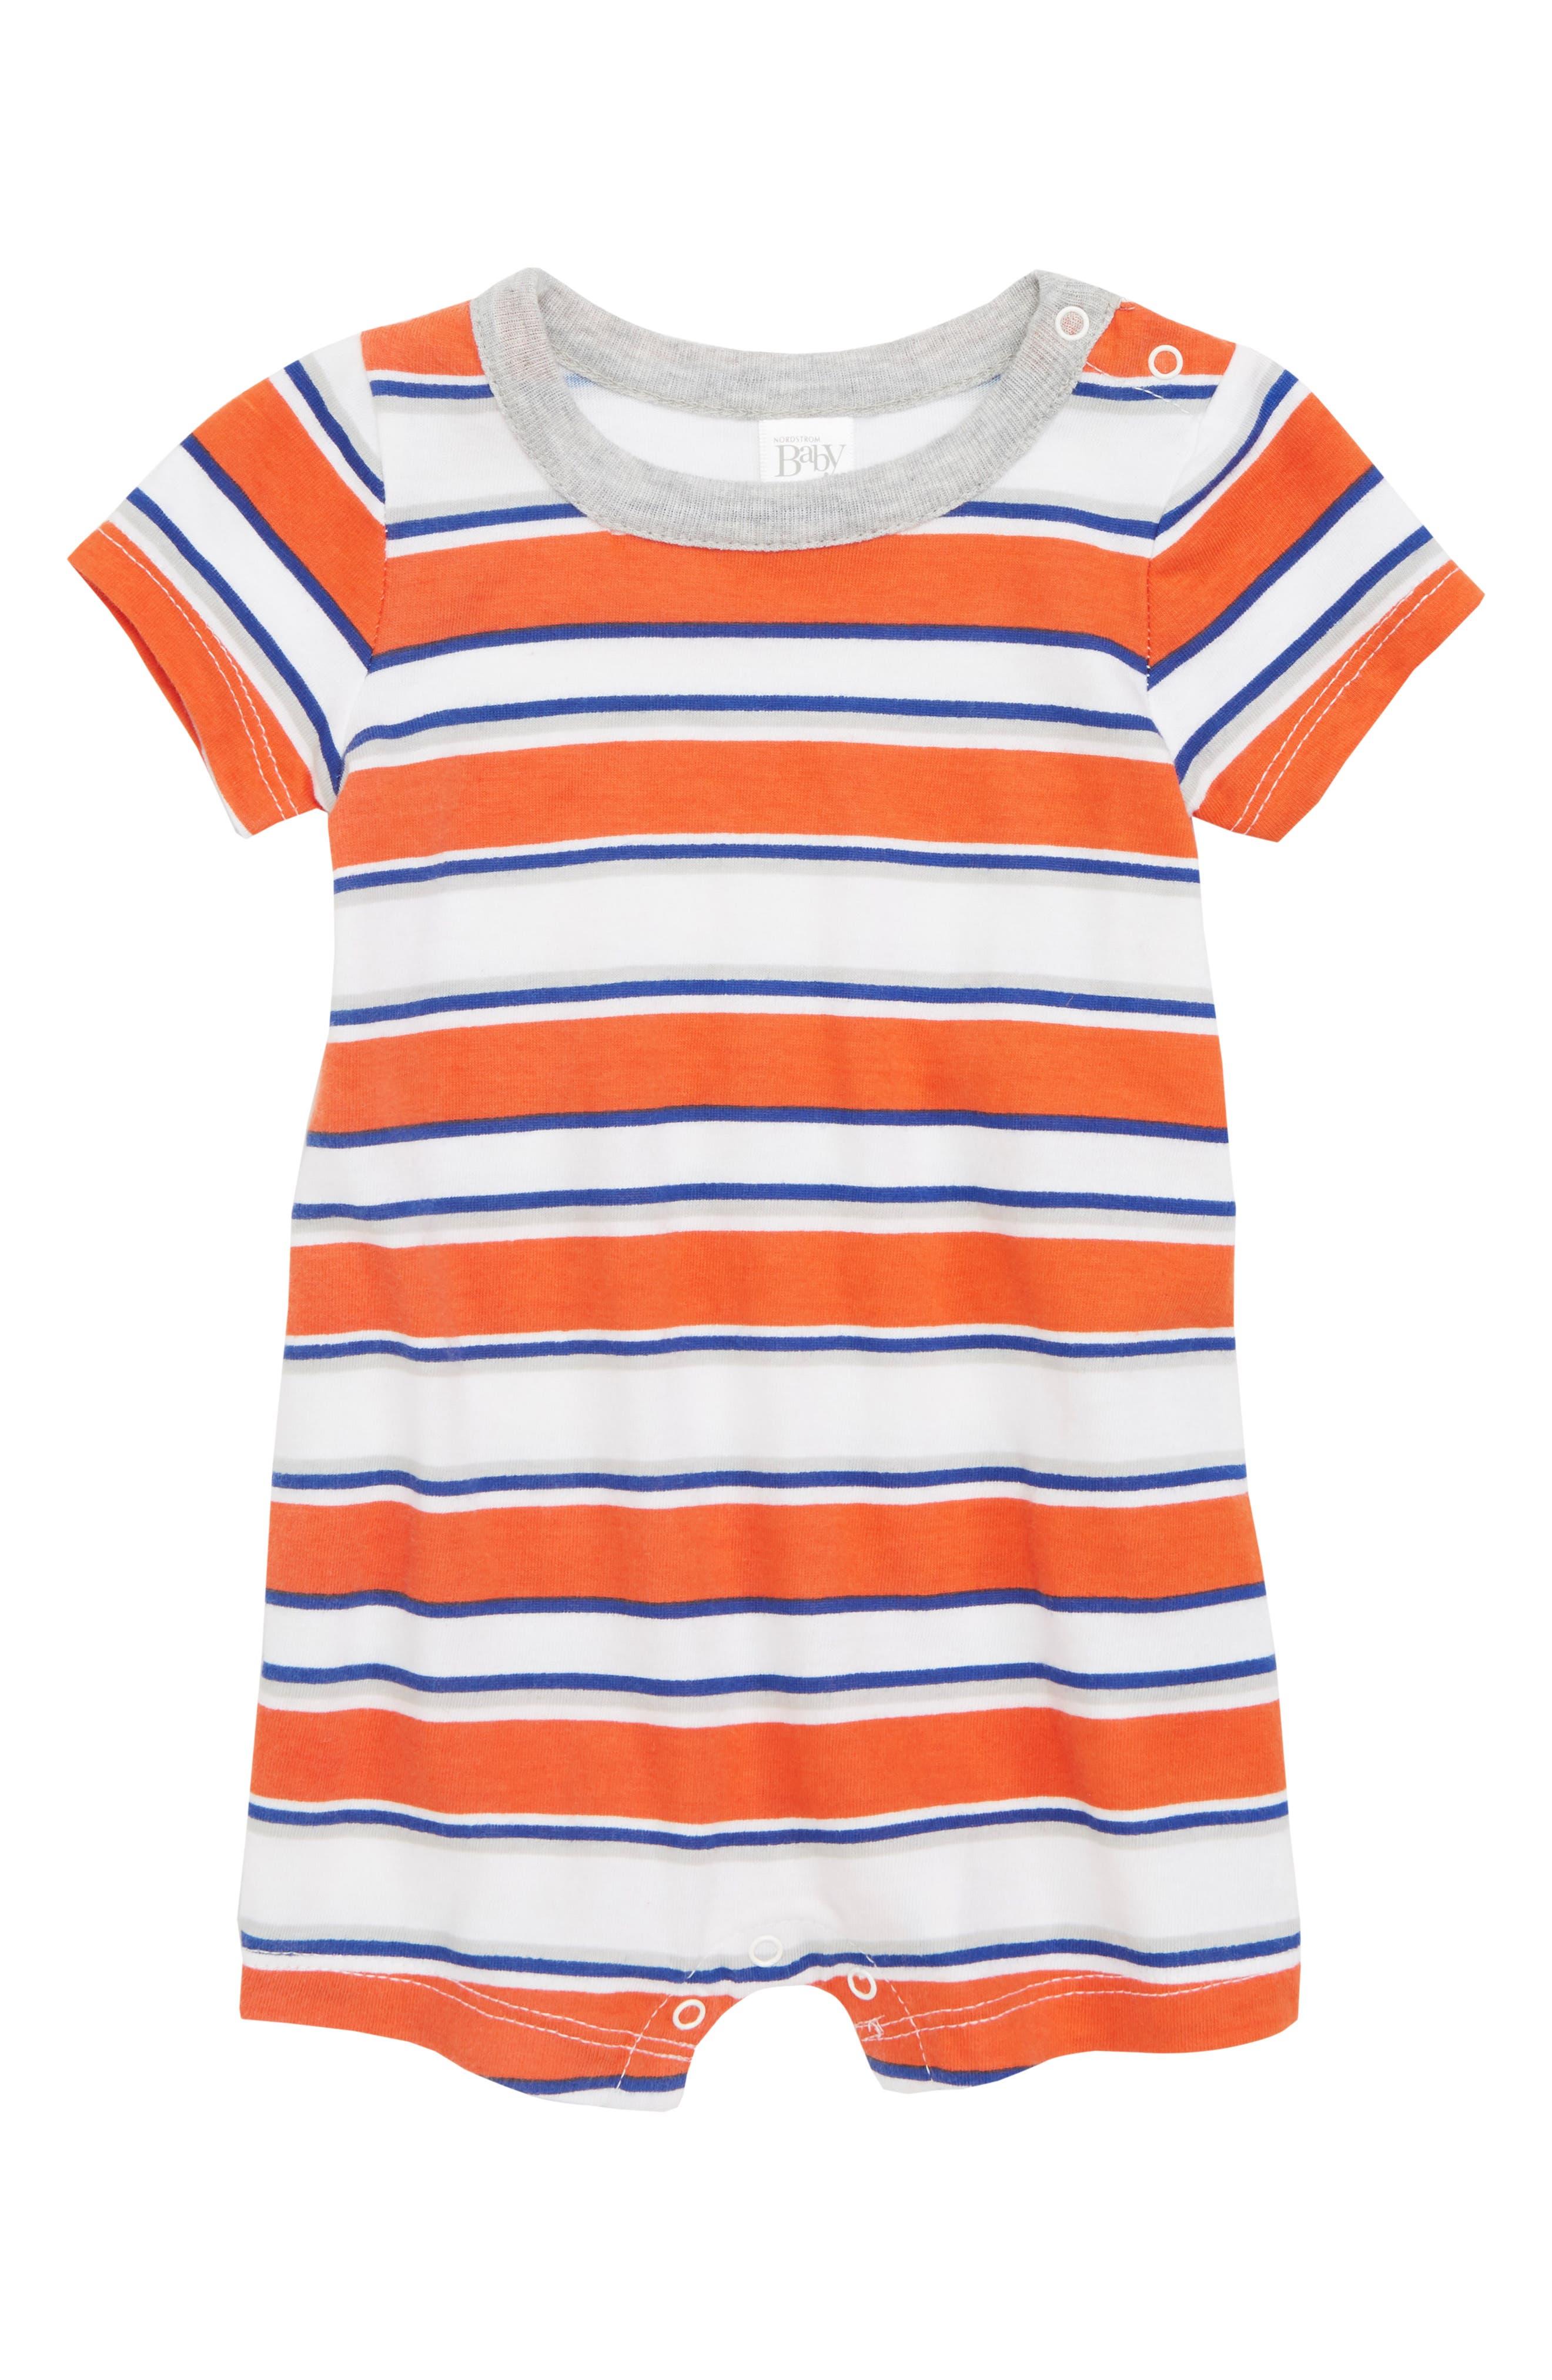 Stripe Romper,                         Main,                         color, Orange Lily Sunset Stripe